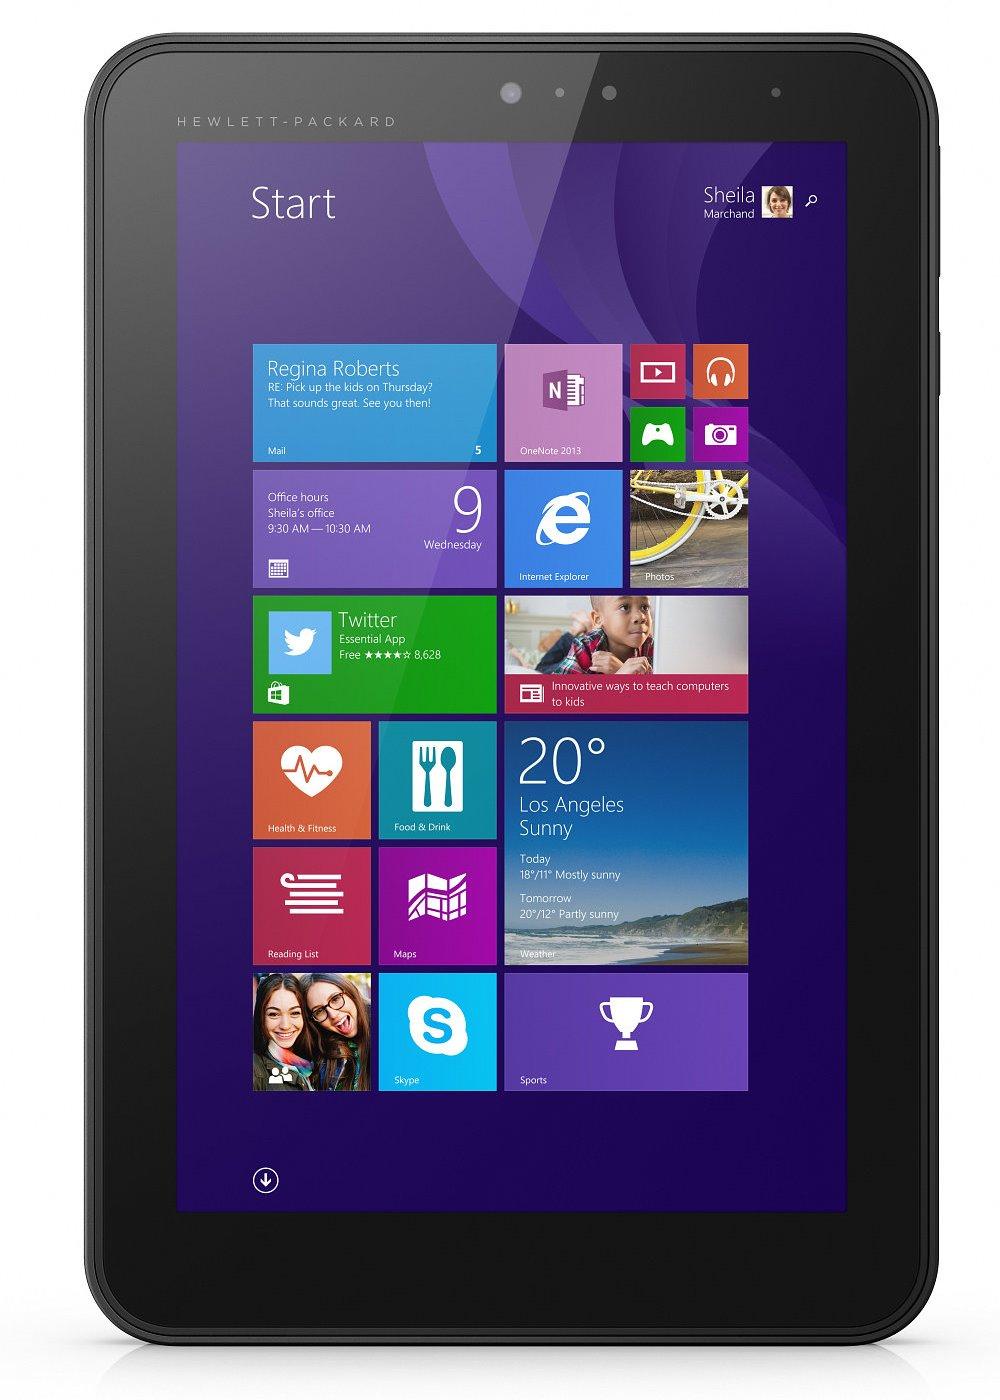 Tablet HP Pro Tablet 408 G1 Tablet, 8, Intel Atom Z3736F, 2 GB, 32 GB + MicroSD, microHDMI, WiFi, BT, Stylus, Win10 Home H9X73EABCM